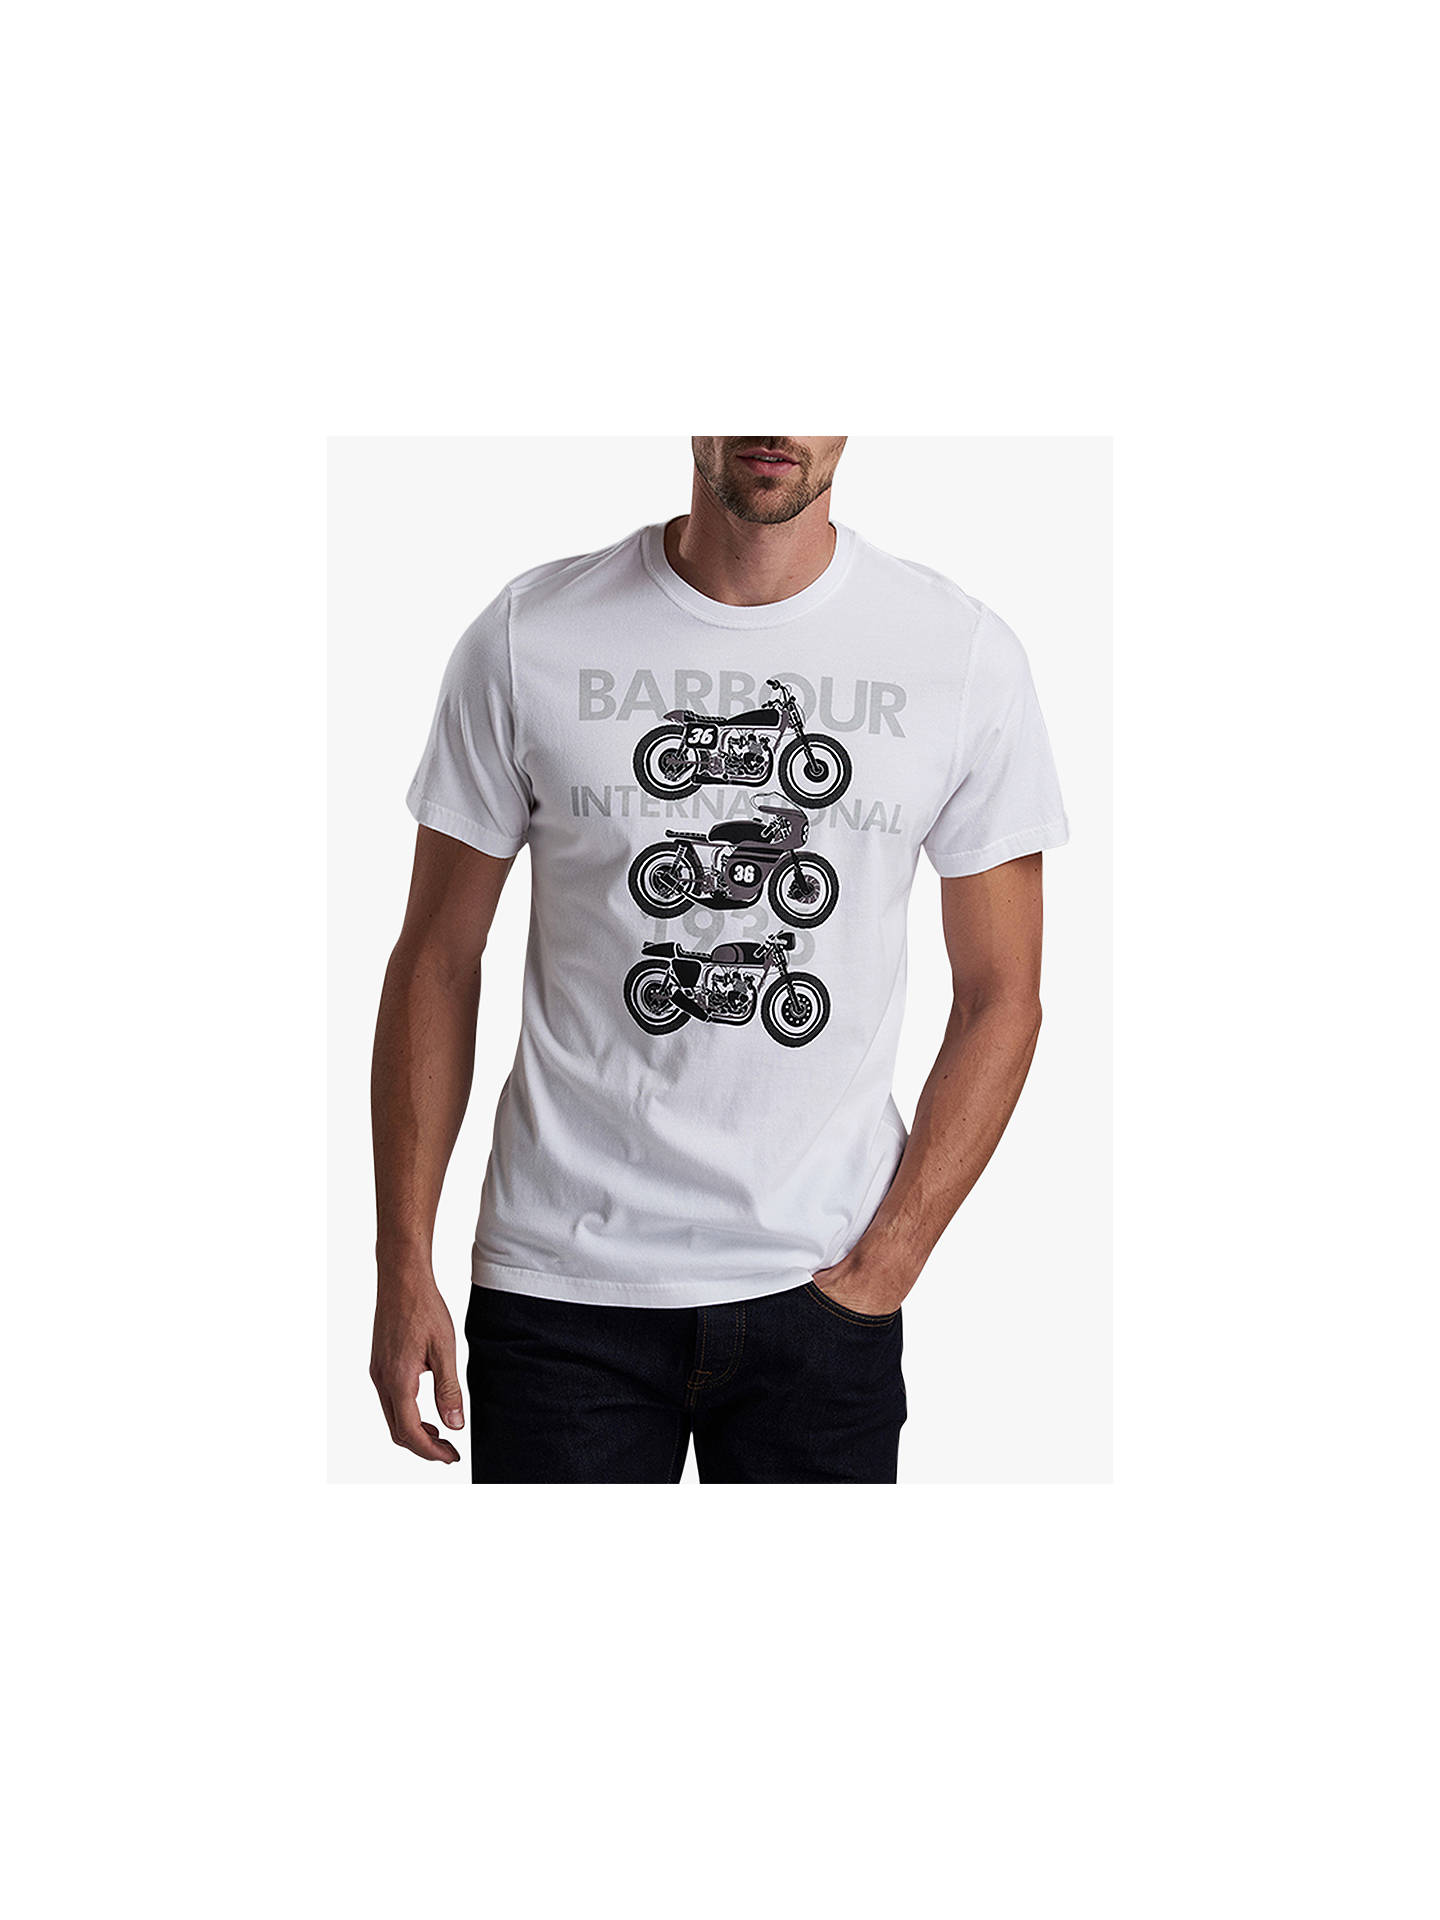 ae640e0f495 Buy Barbour International Bikes Short Sleeve Graphic T-Shirt, White, S  Online at ...